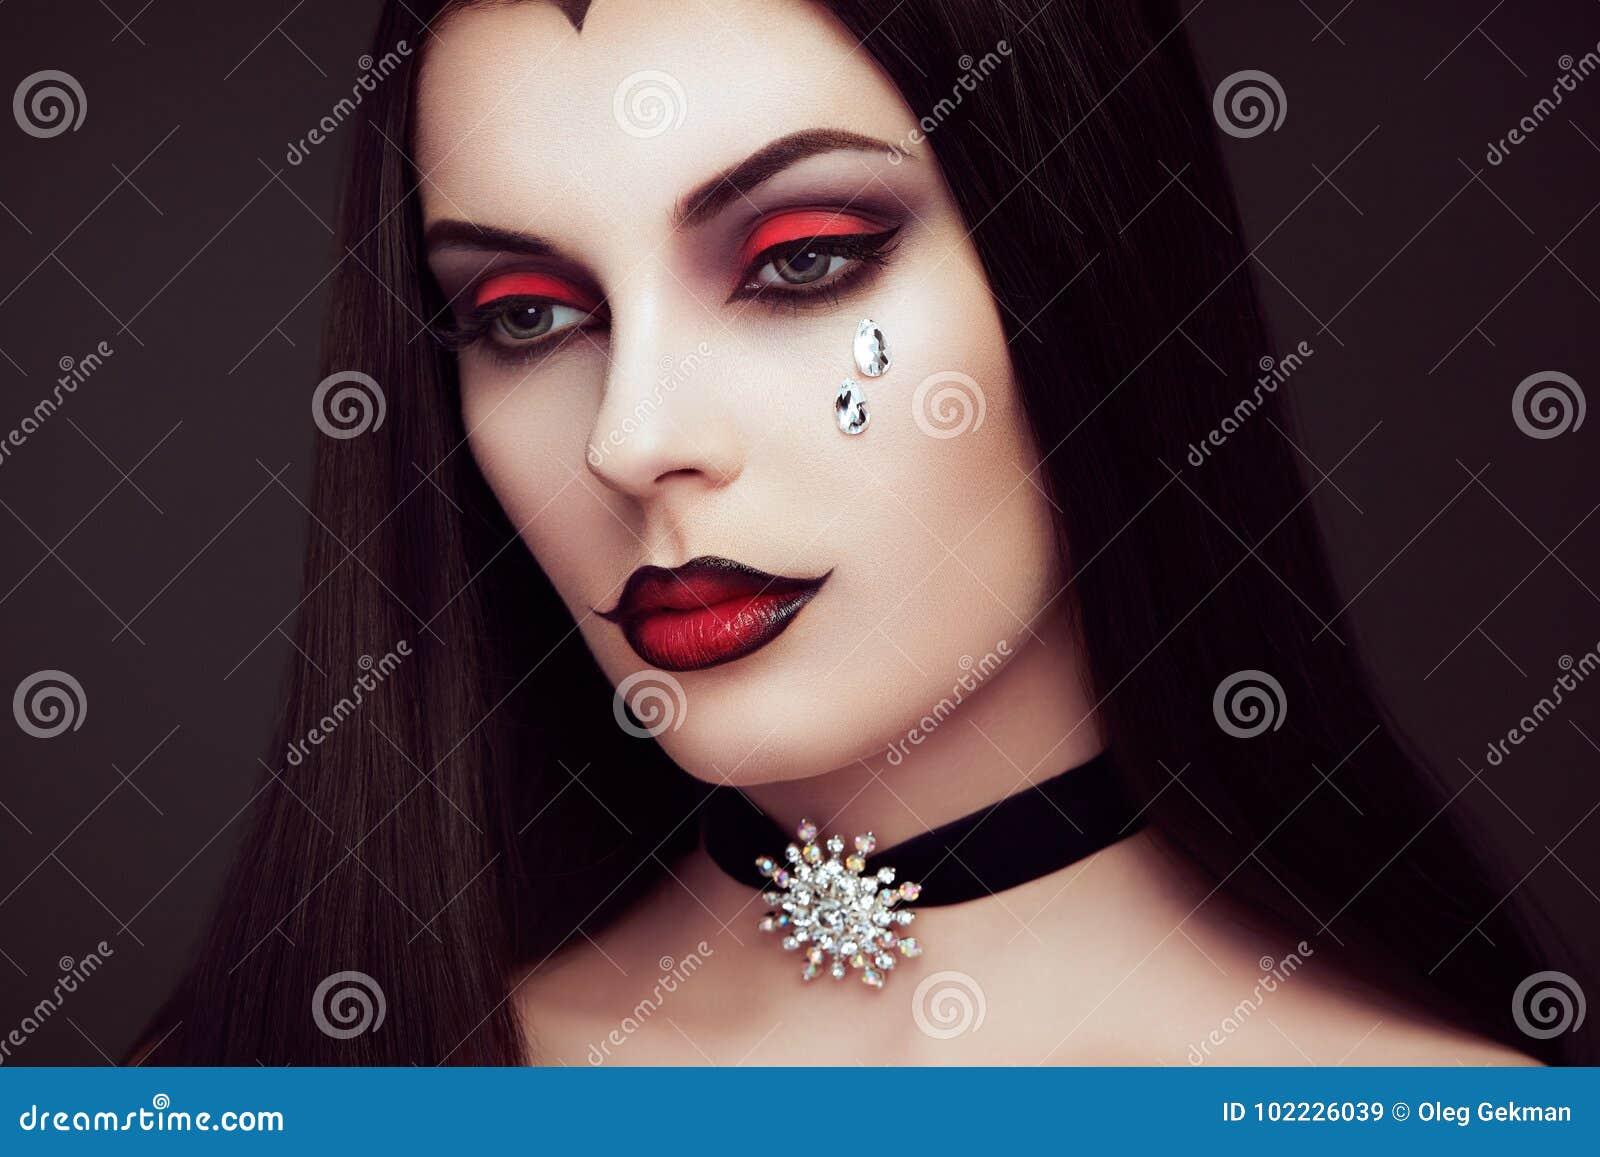 Halloween Vampire Woman Portrait Stock Image